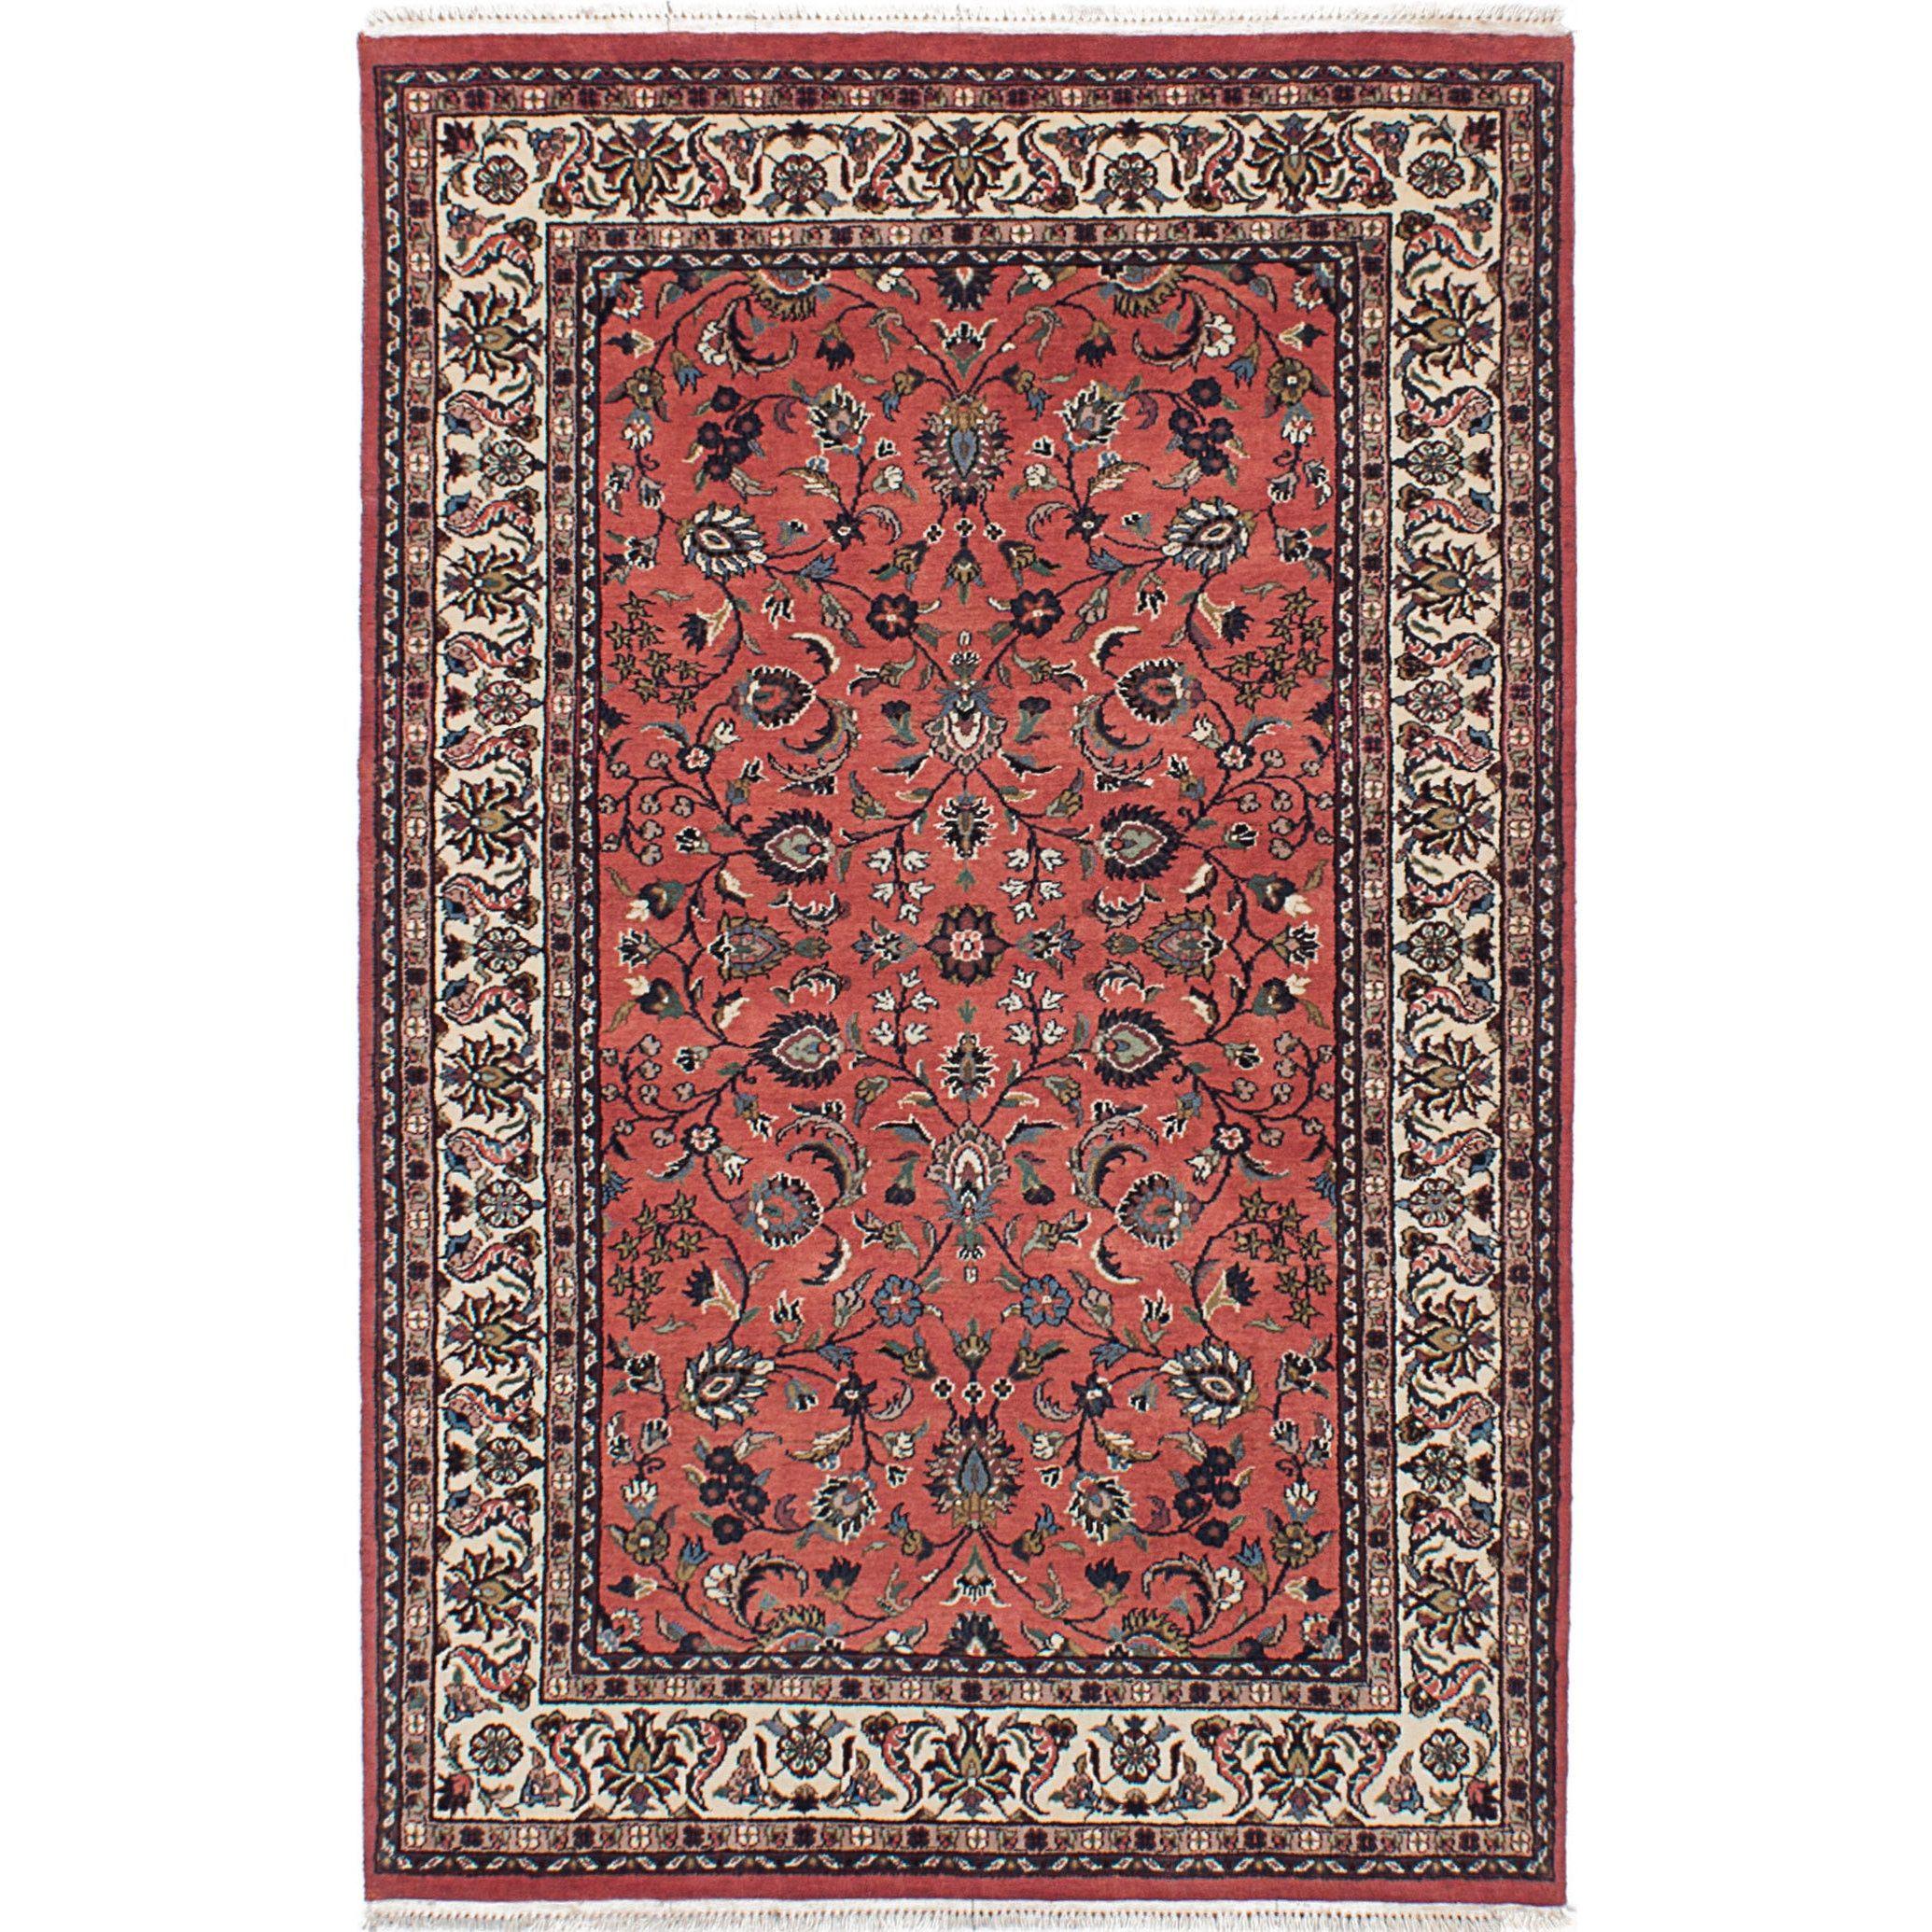 Ecarpetgallery Hand Knotted Royal Kashan Pink Wool Rug 4 0 X 6